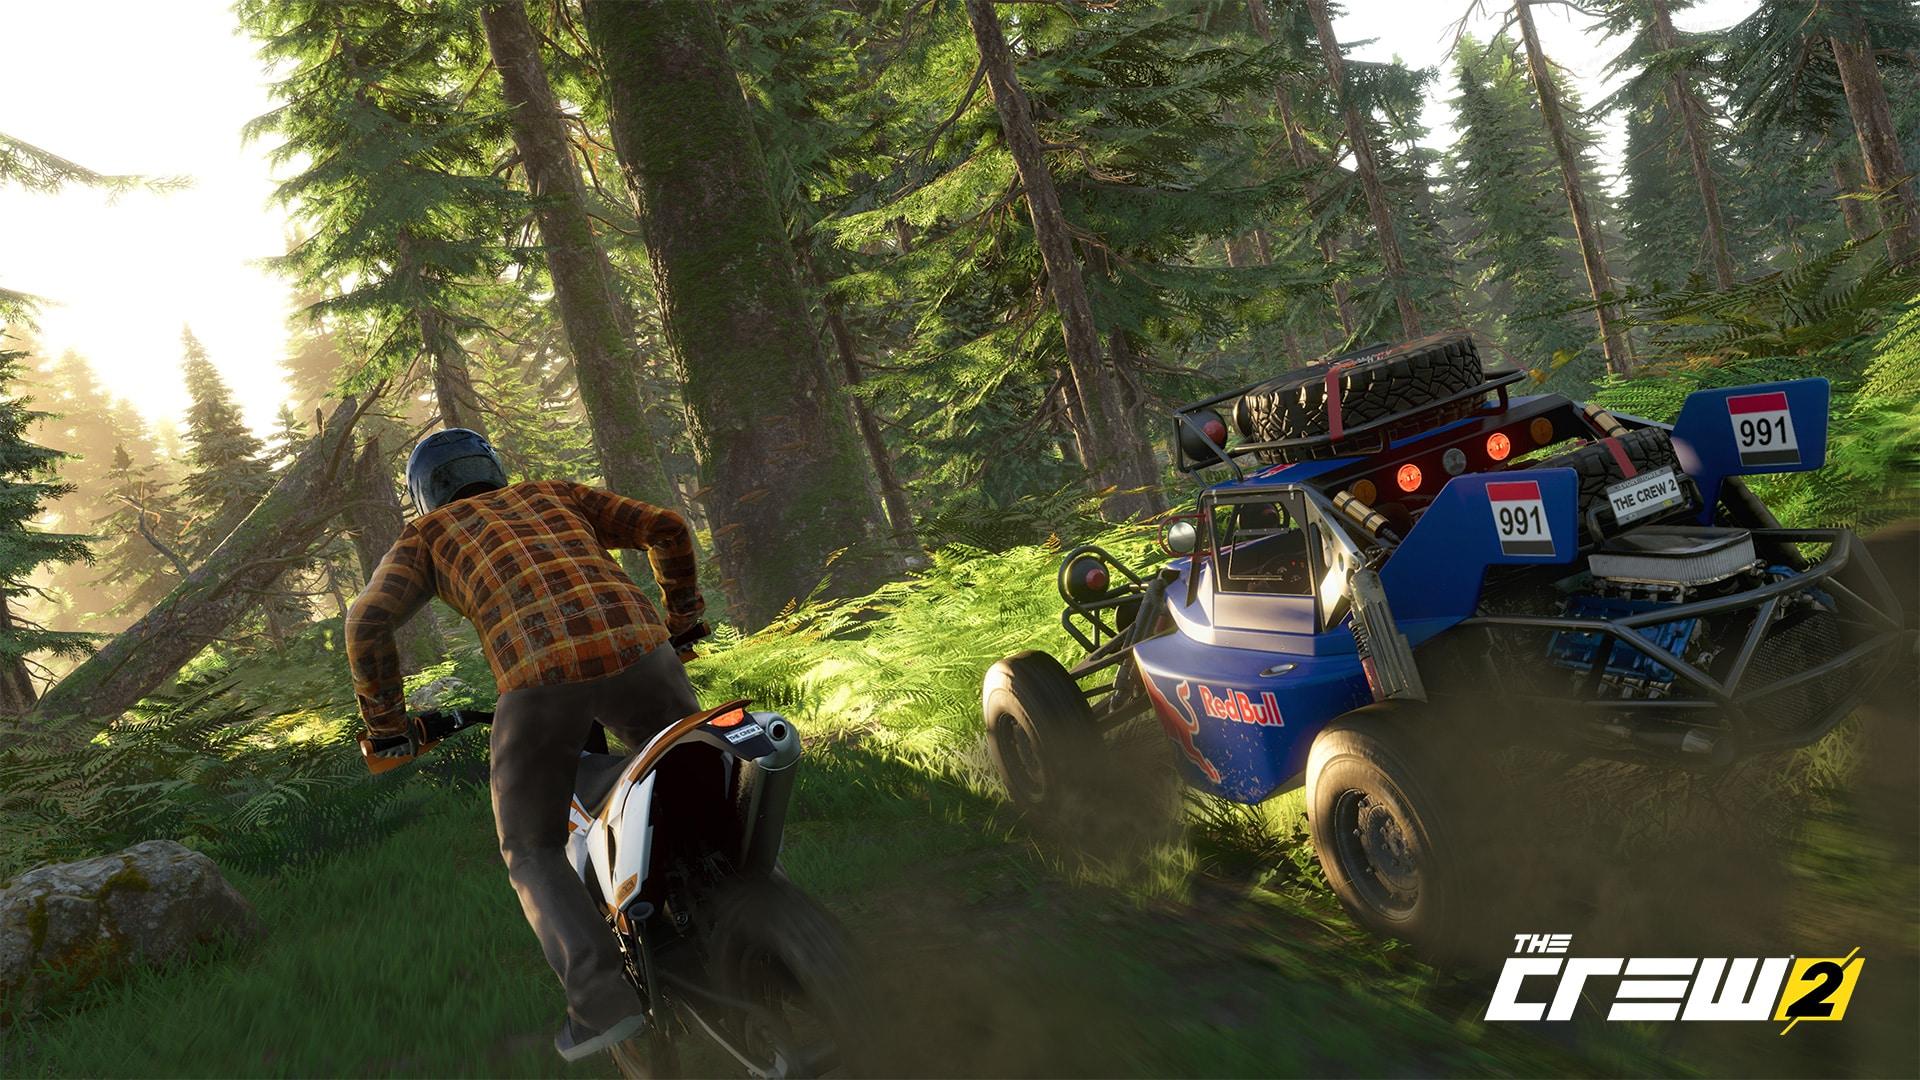 The Crew 2 : jeu vidéo de courses moto